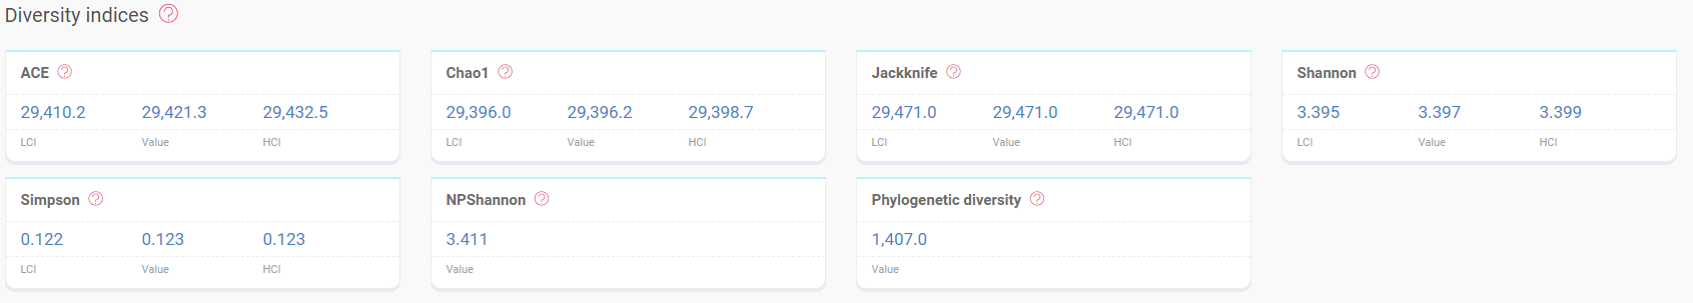 Alpha-diversity indices